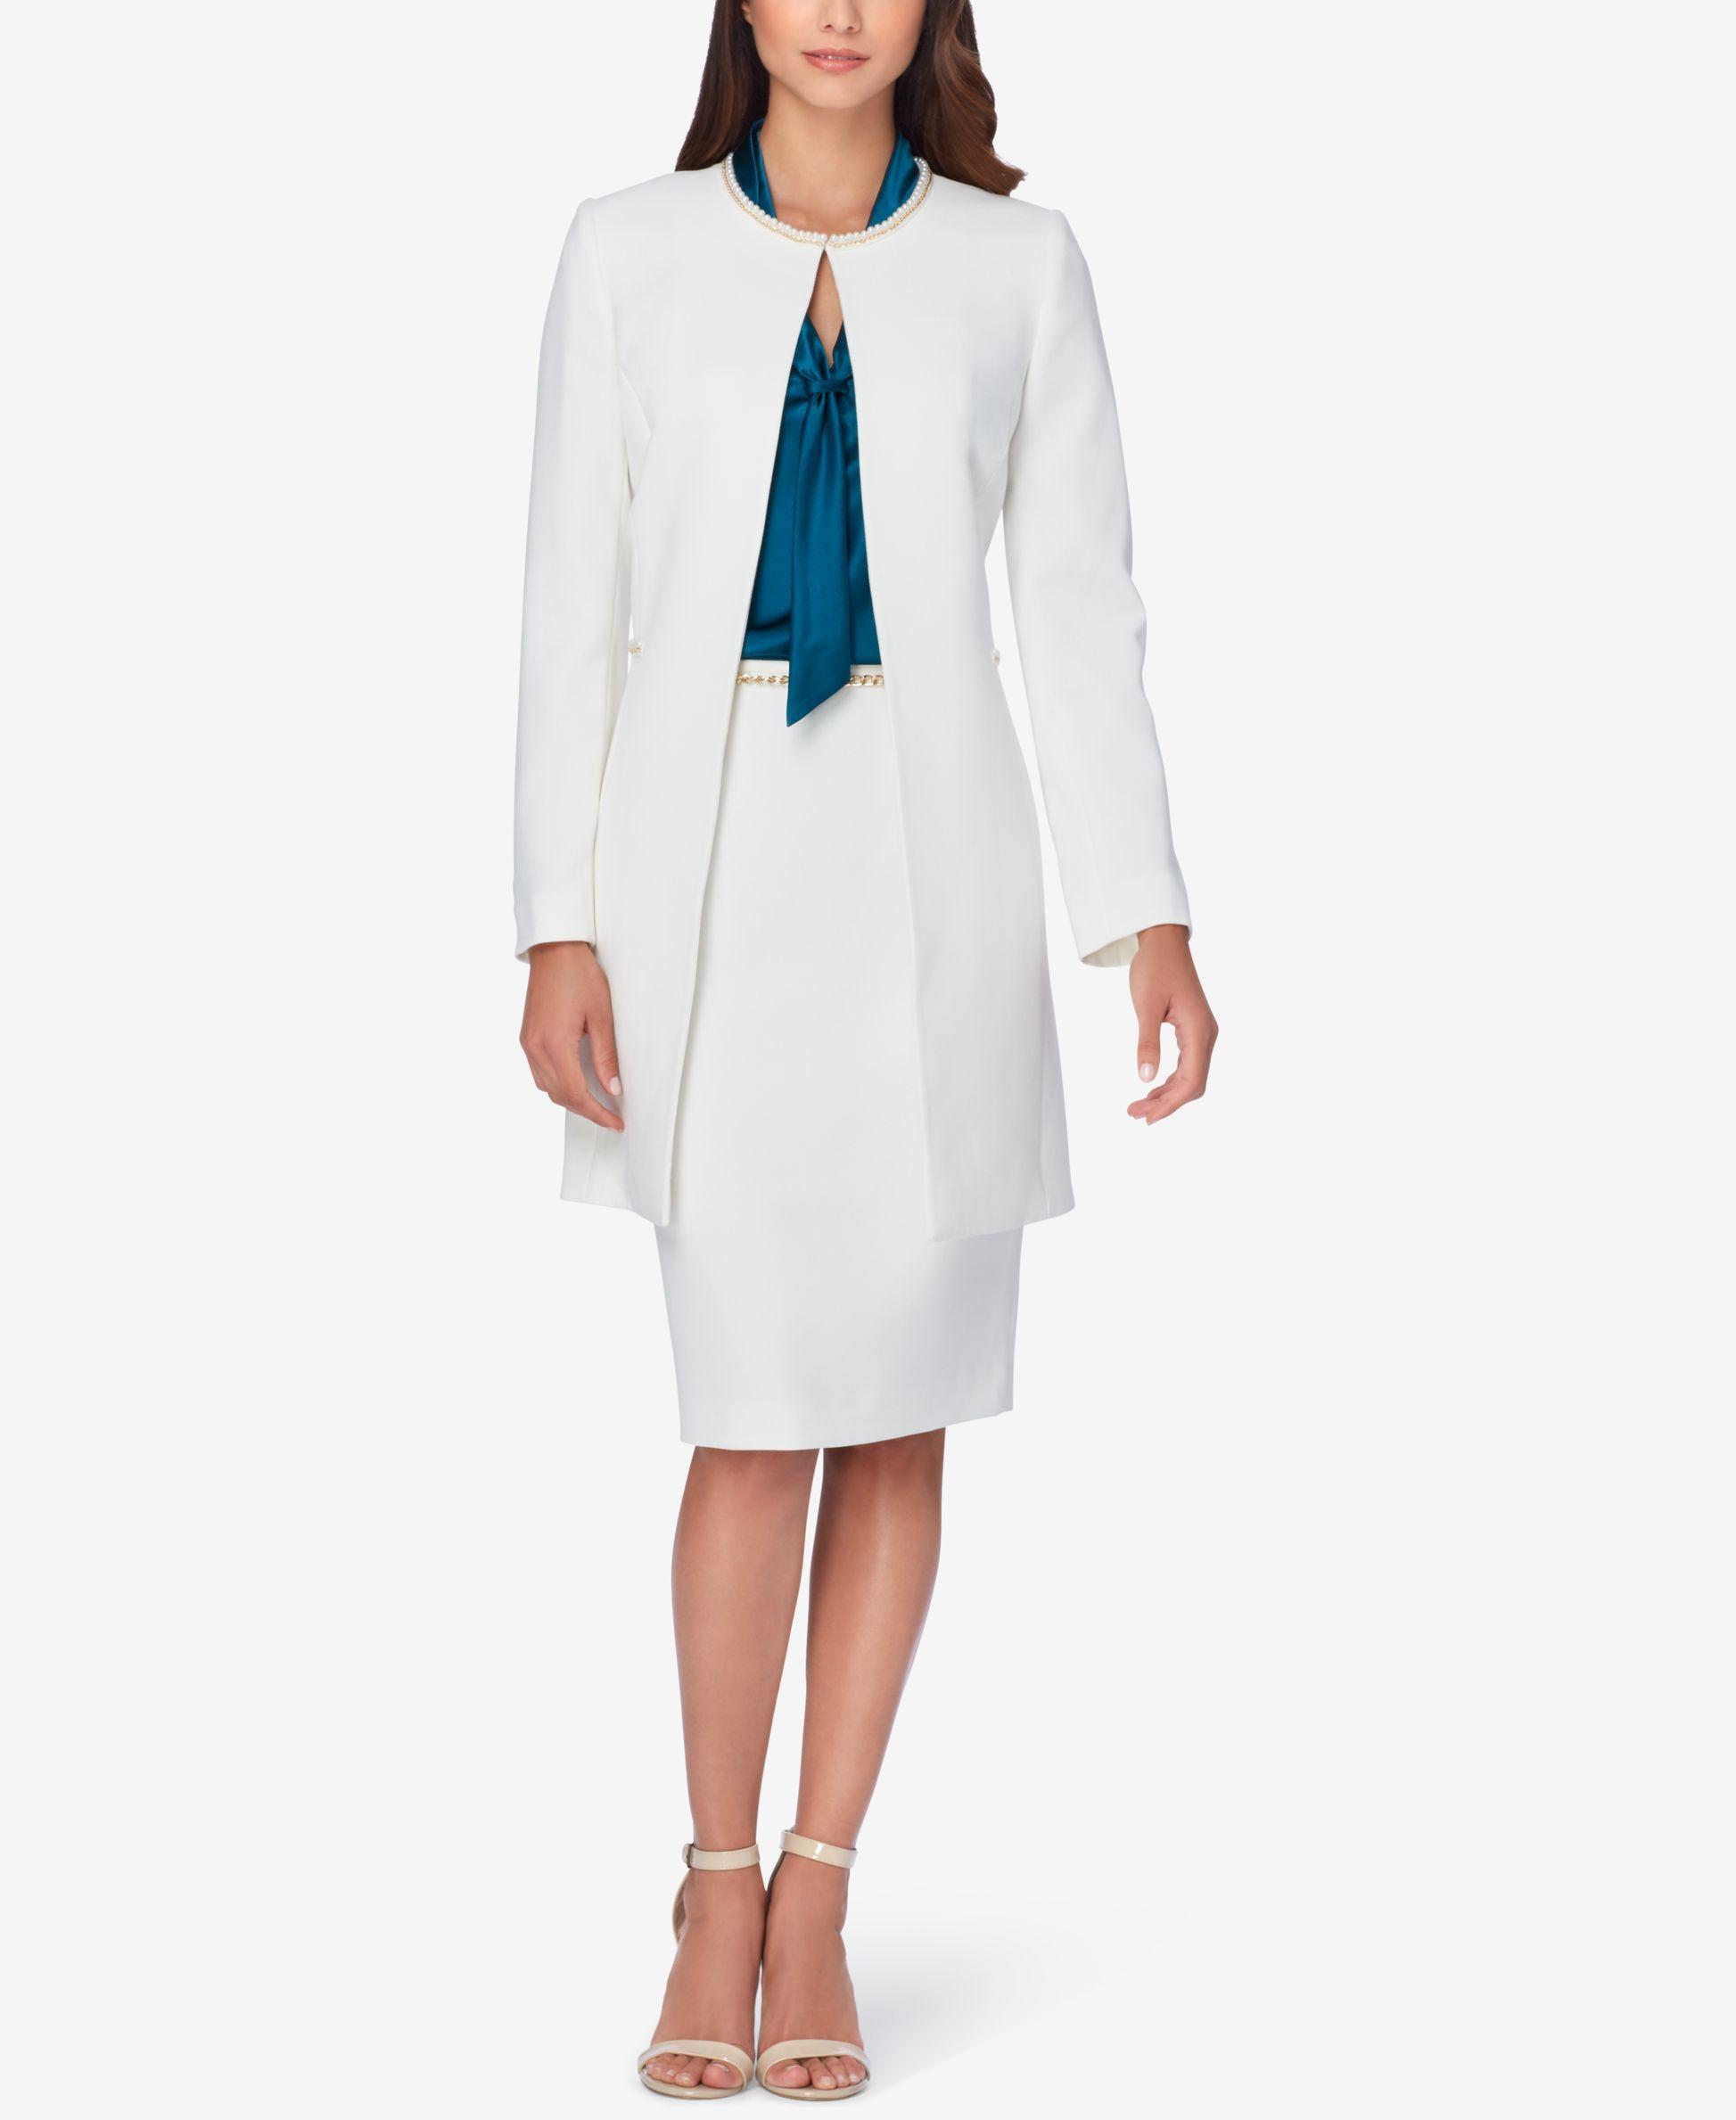 2f7df011585 Tahari Asl Petite Embellished Topper Jacket